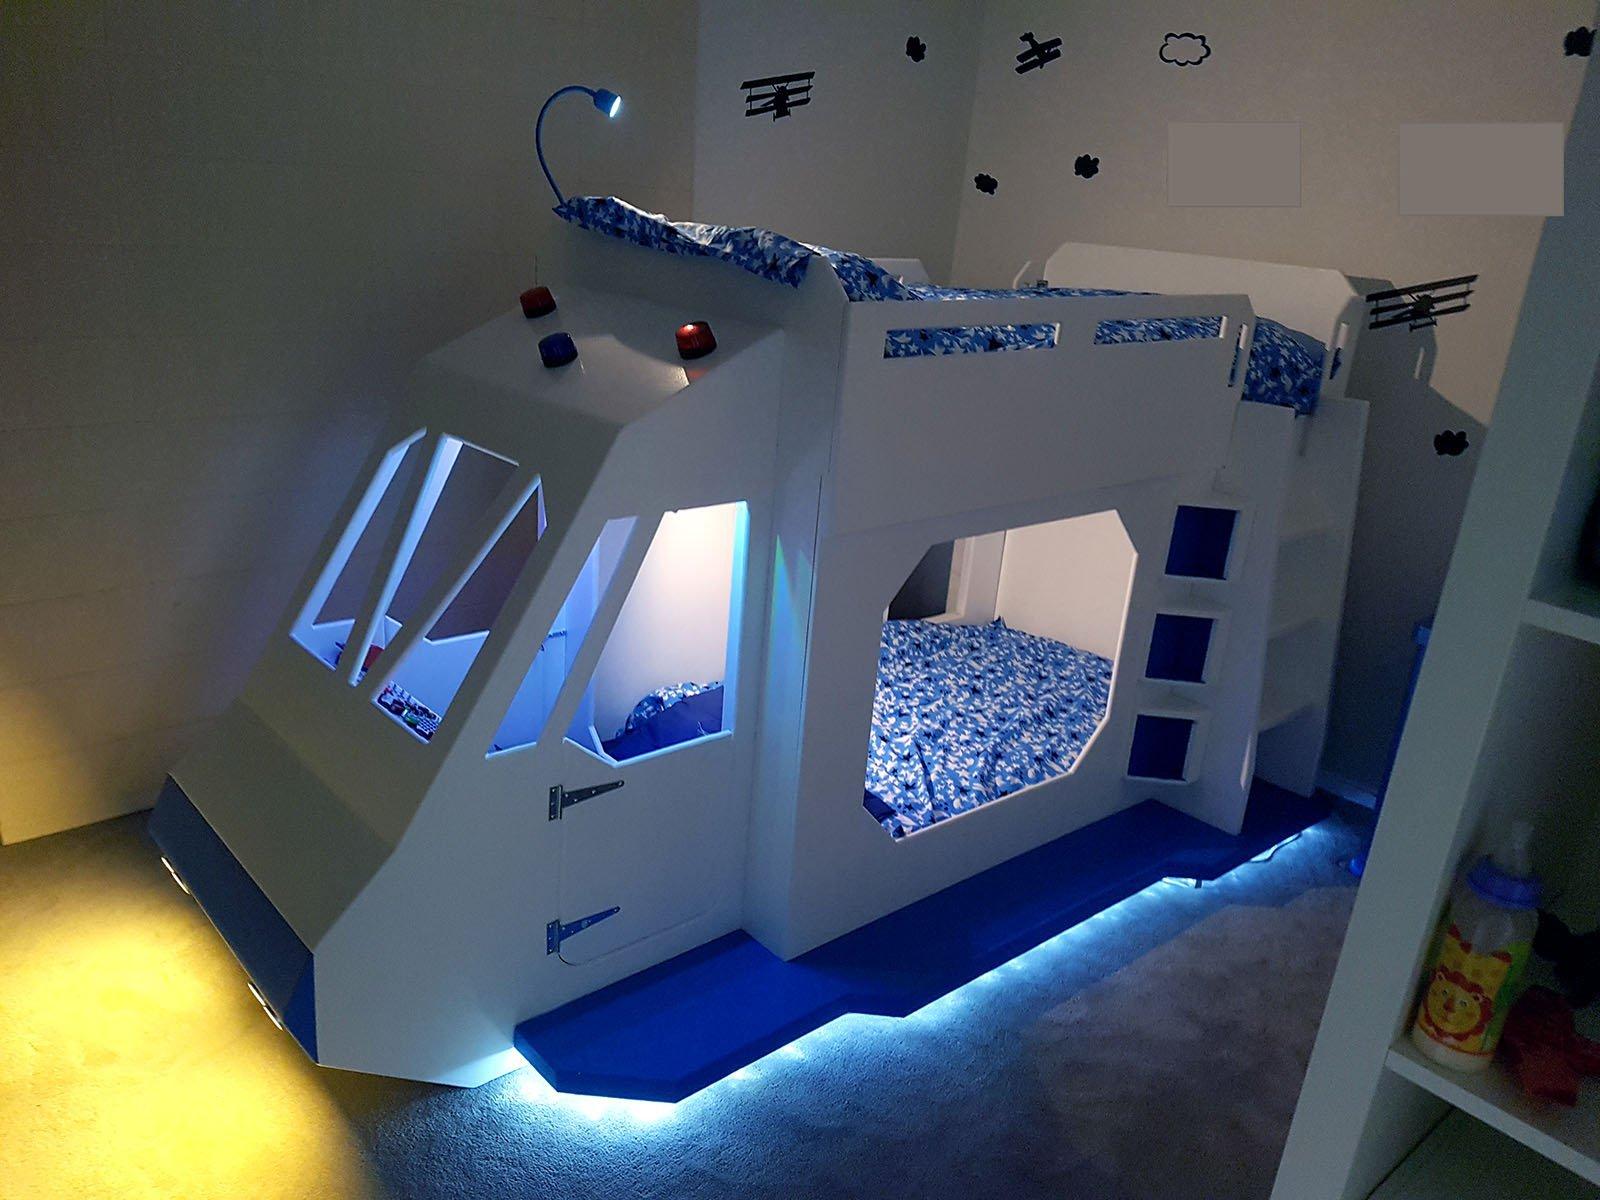 5 4 3 2 1 Spaceship Bunk Bed Raspberry Pi